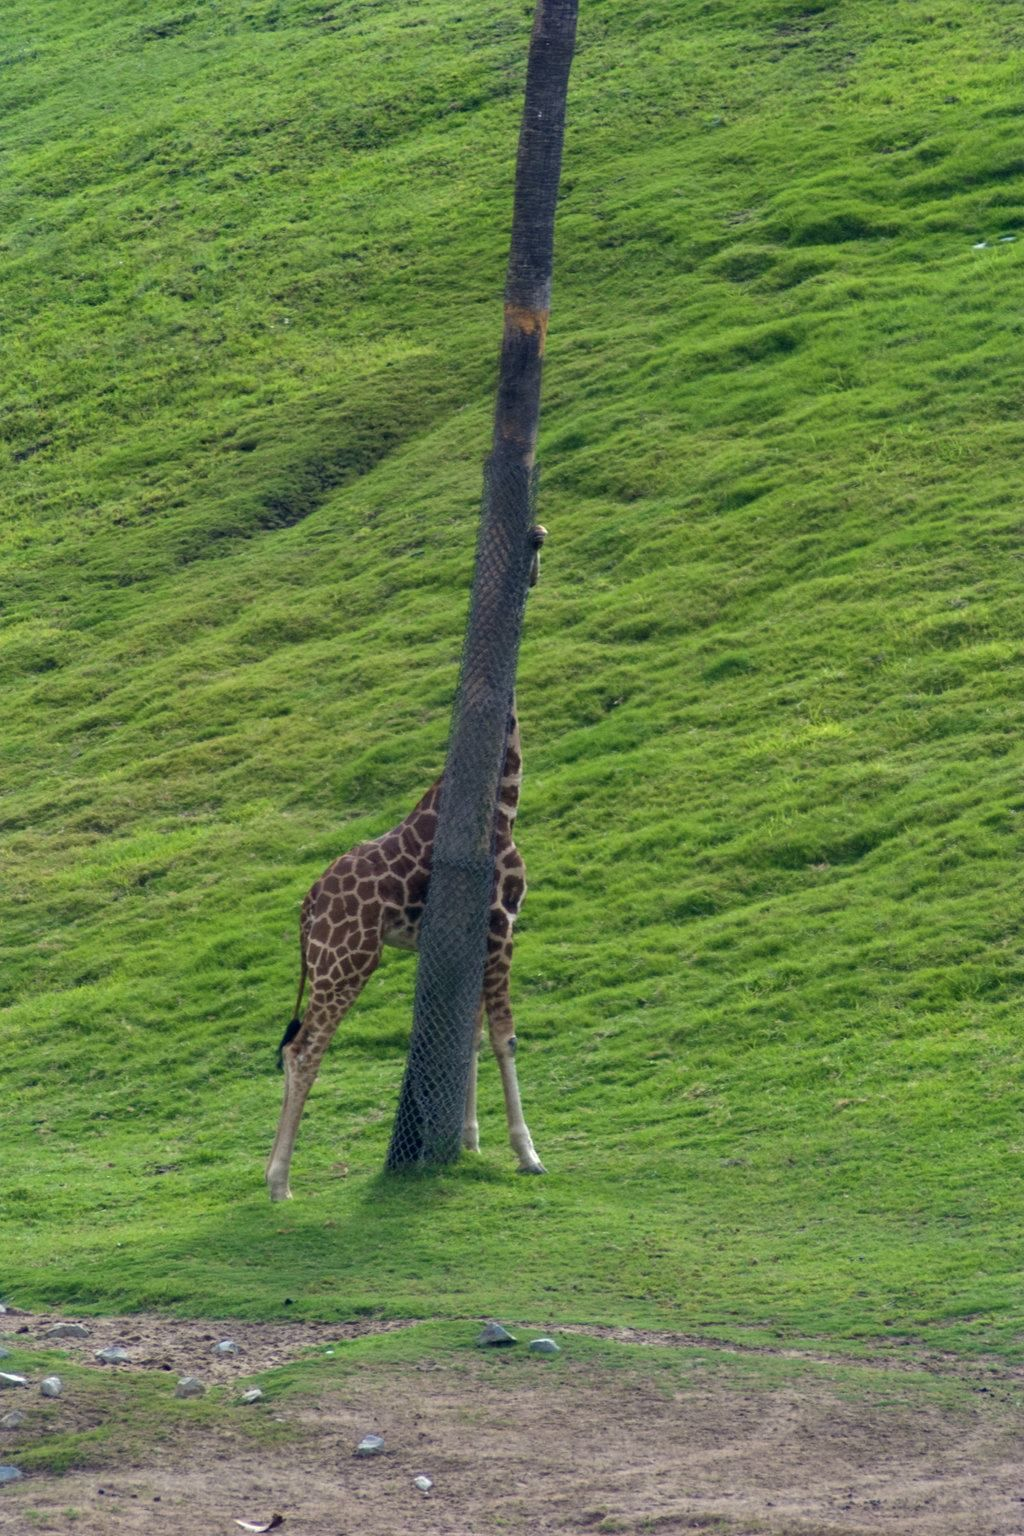 Pin By Sheri Drabin On Giraffe T Giraffe Animals And Zoo